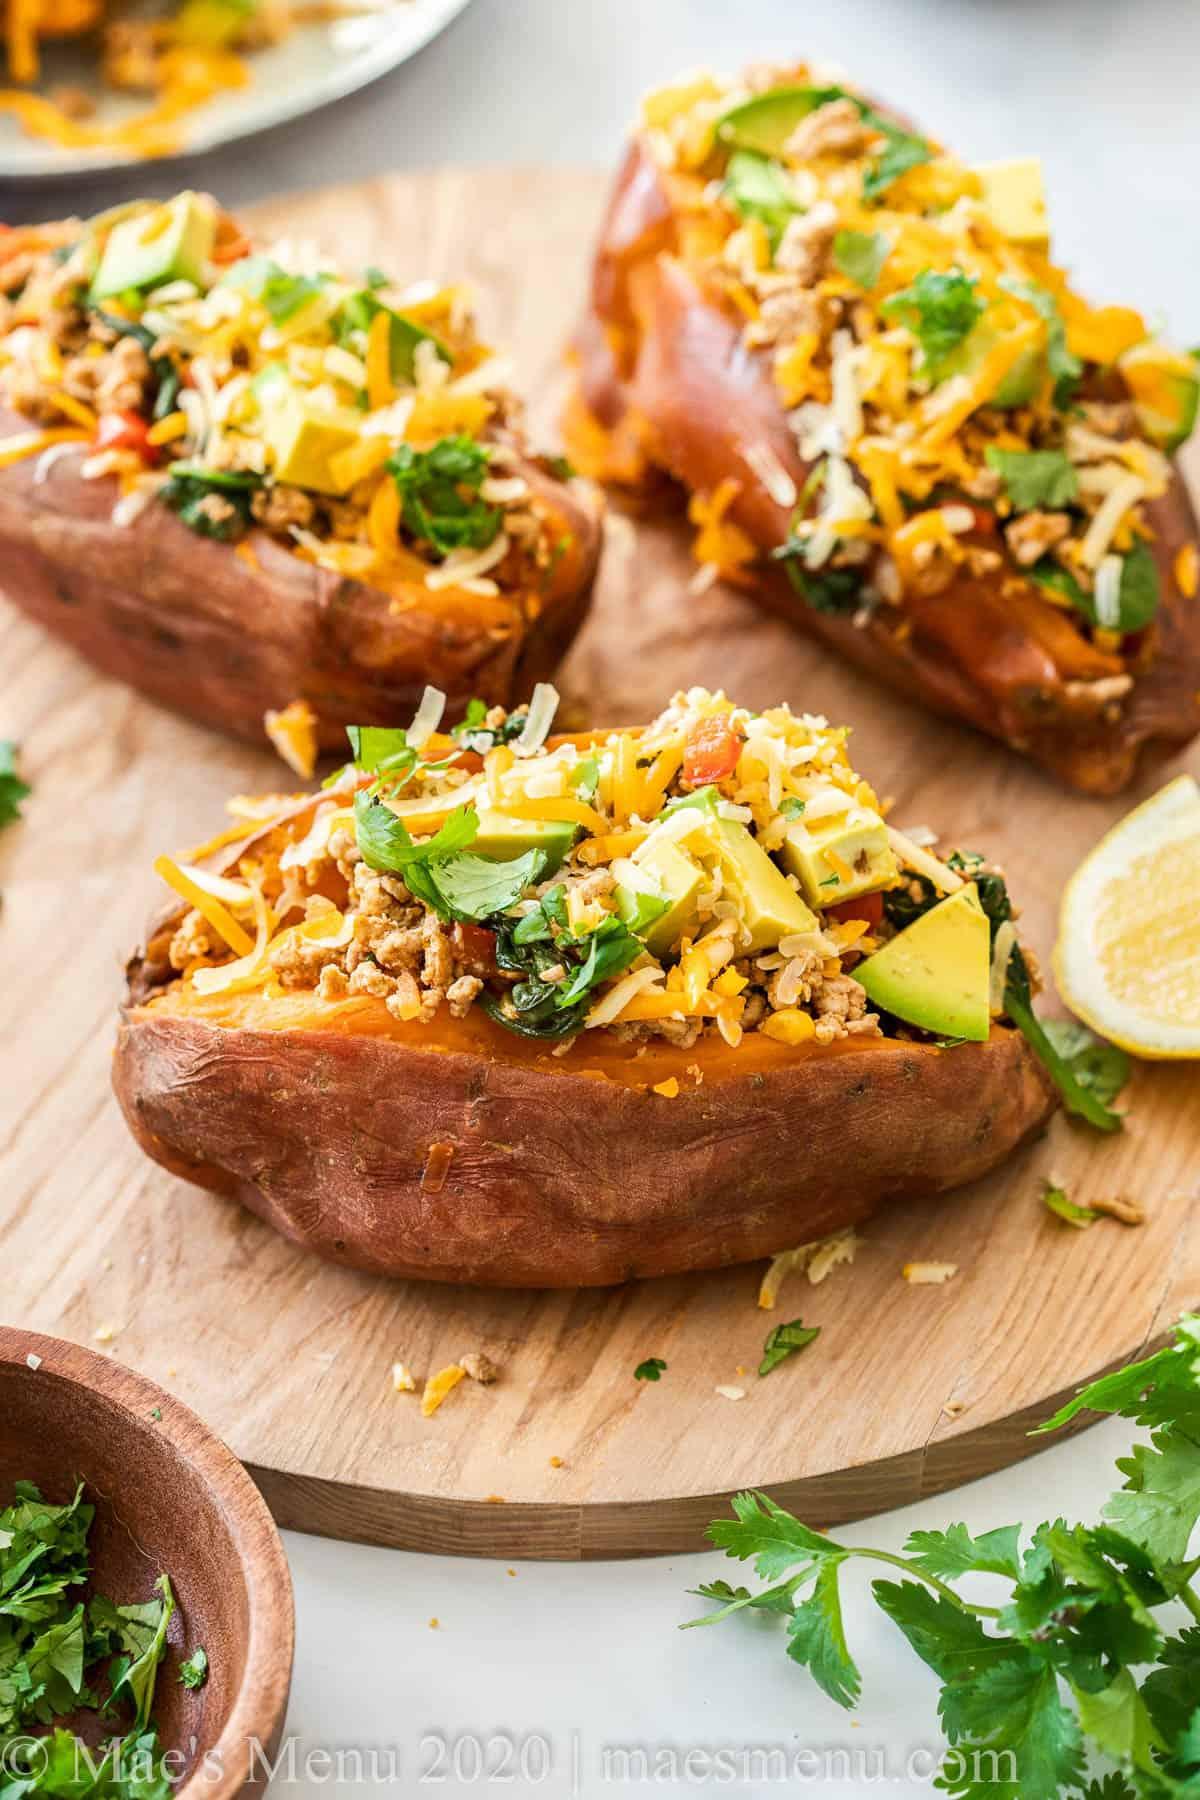 A round platter of taco stuffed sweet potatoes.